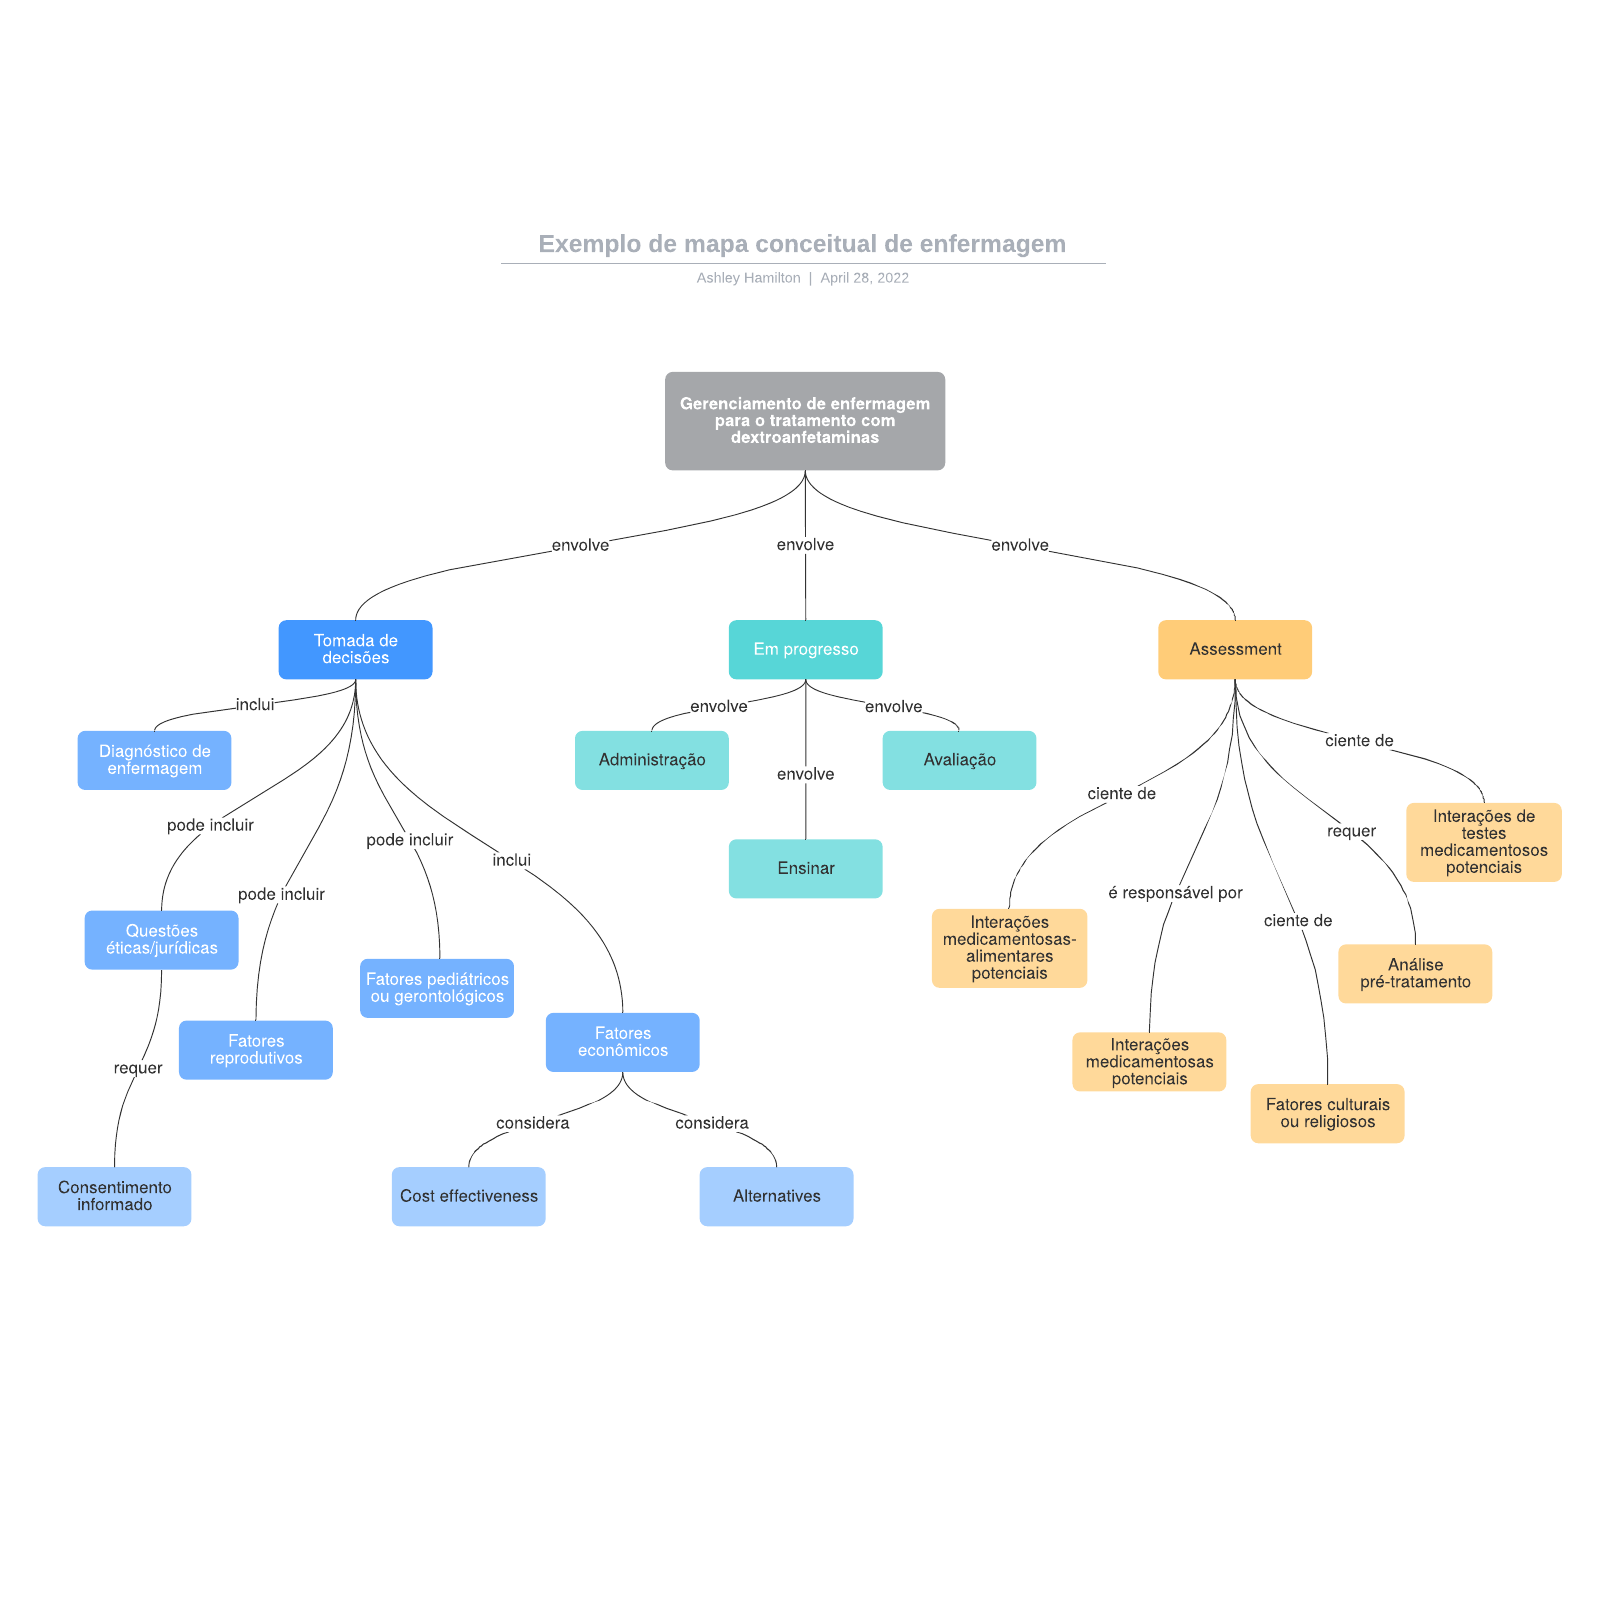 Exemplo de mapa conceitual de enfermagem